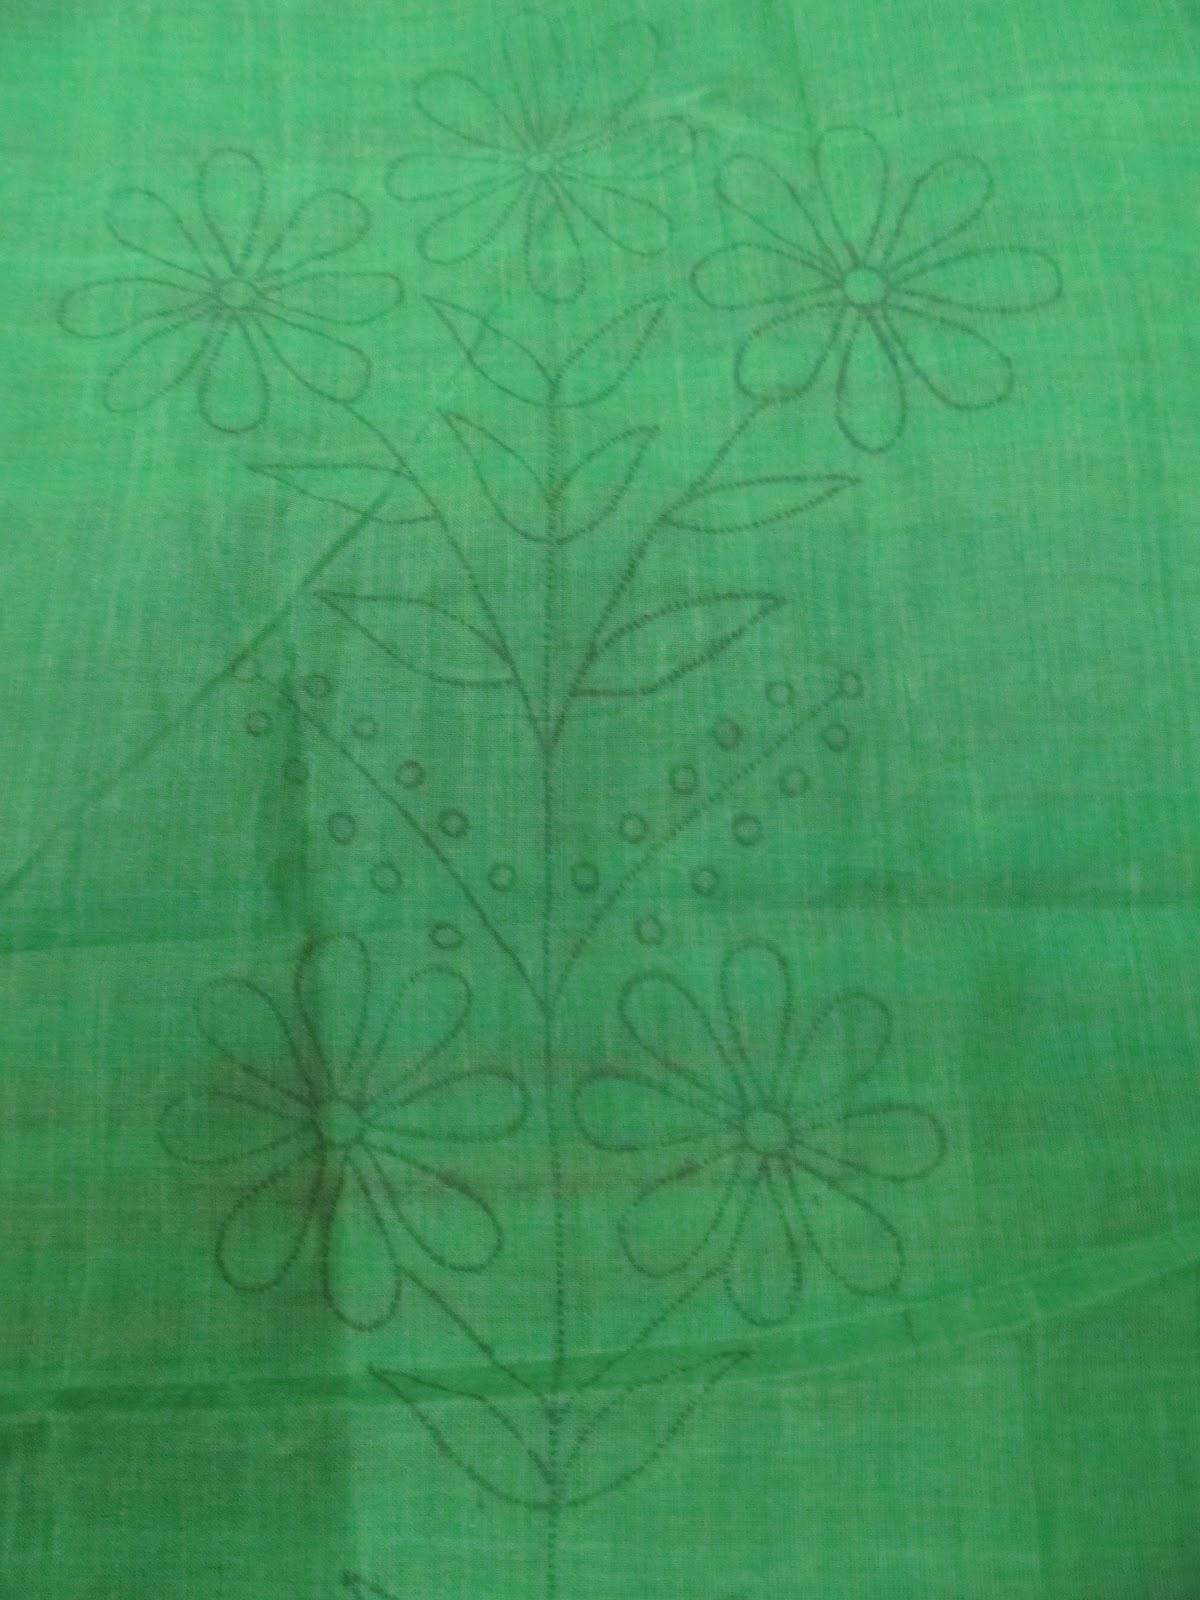 Aamader Blog Hand Embroidered Saree Embroidered Sari